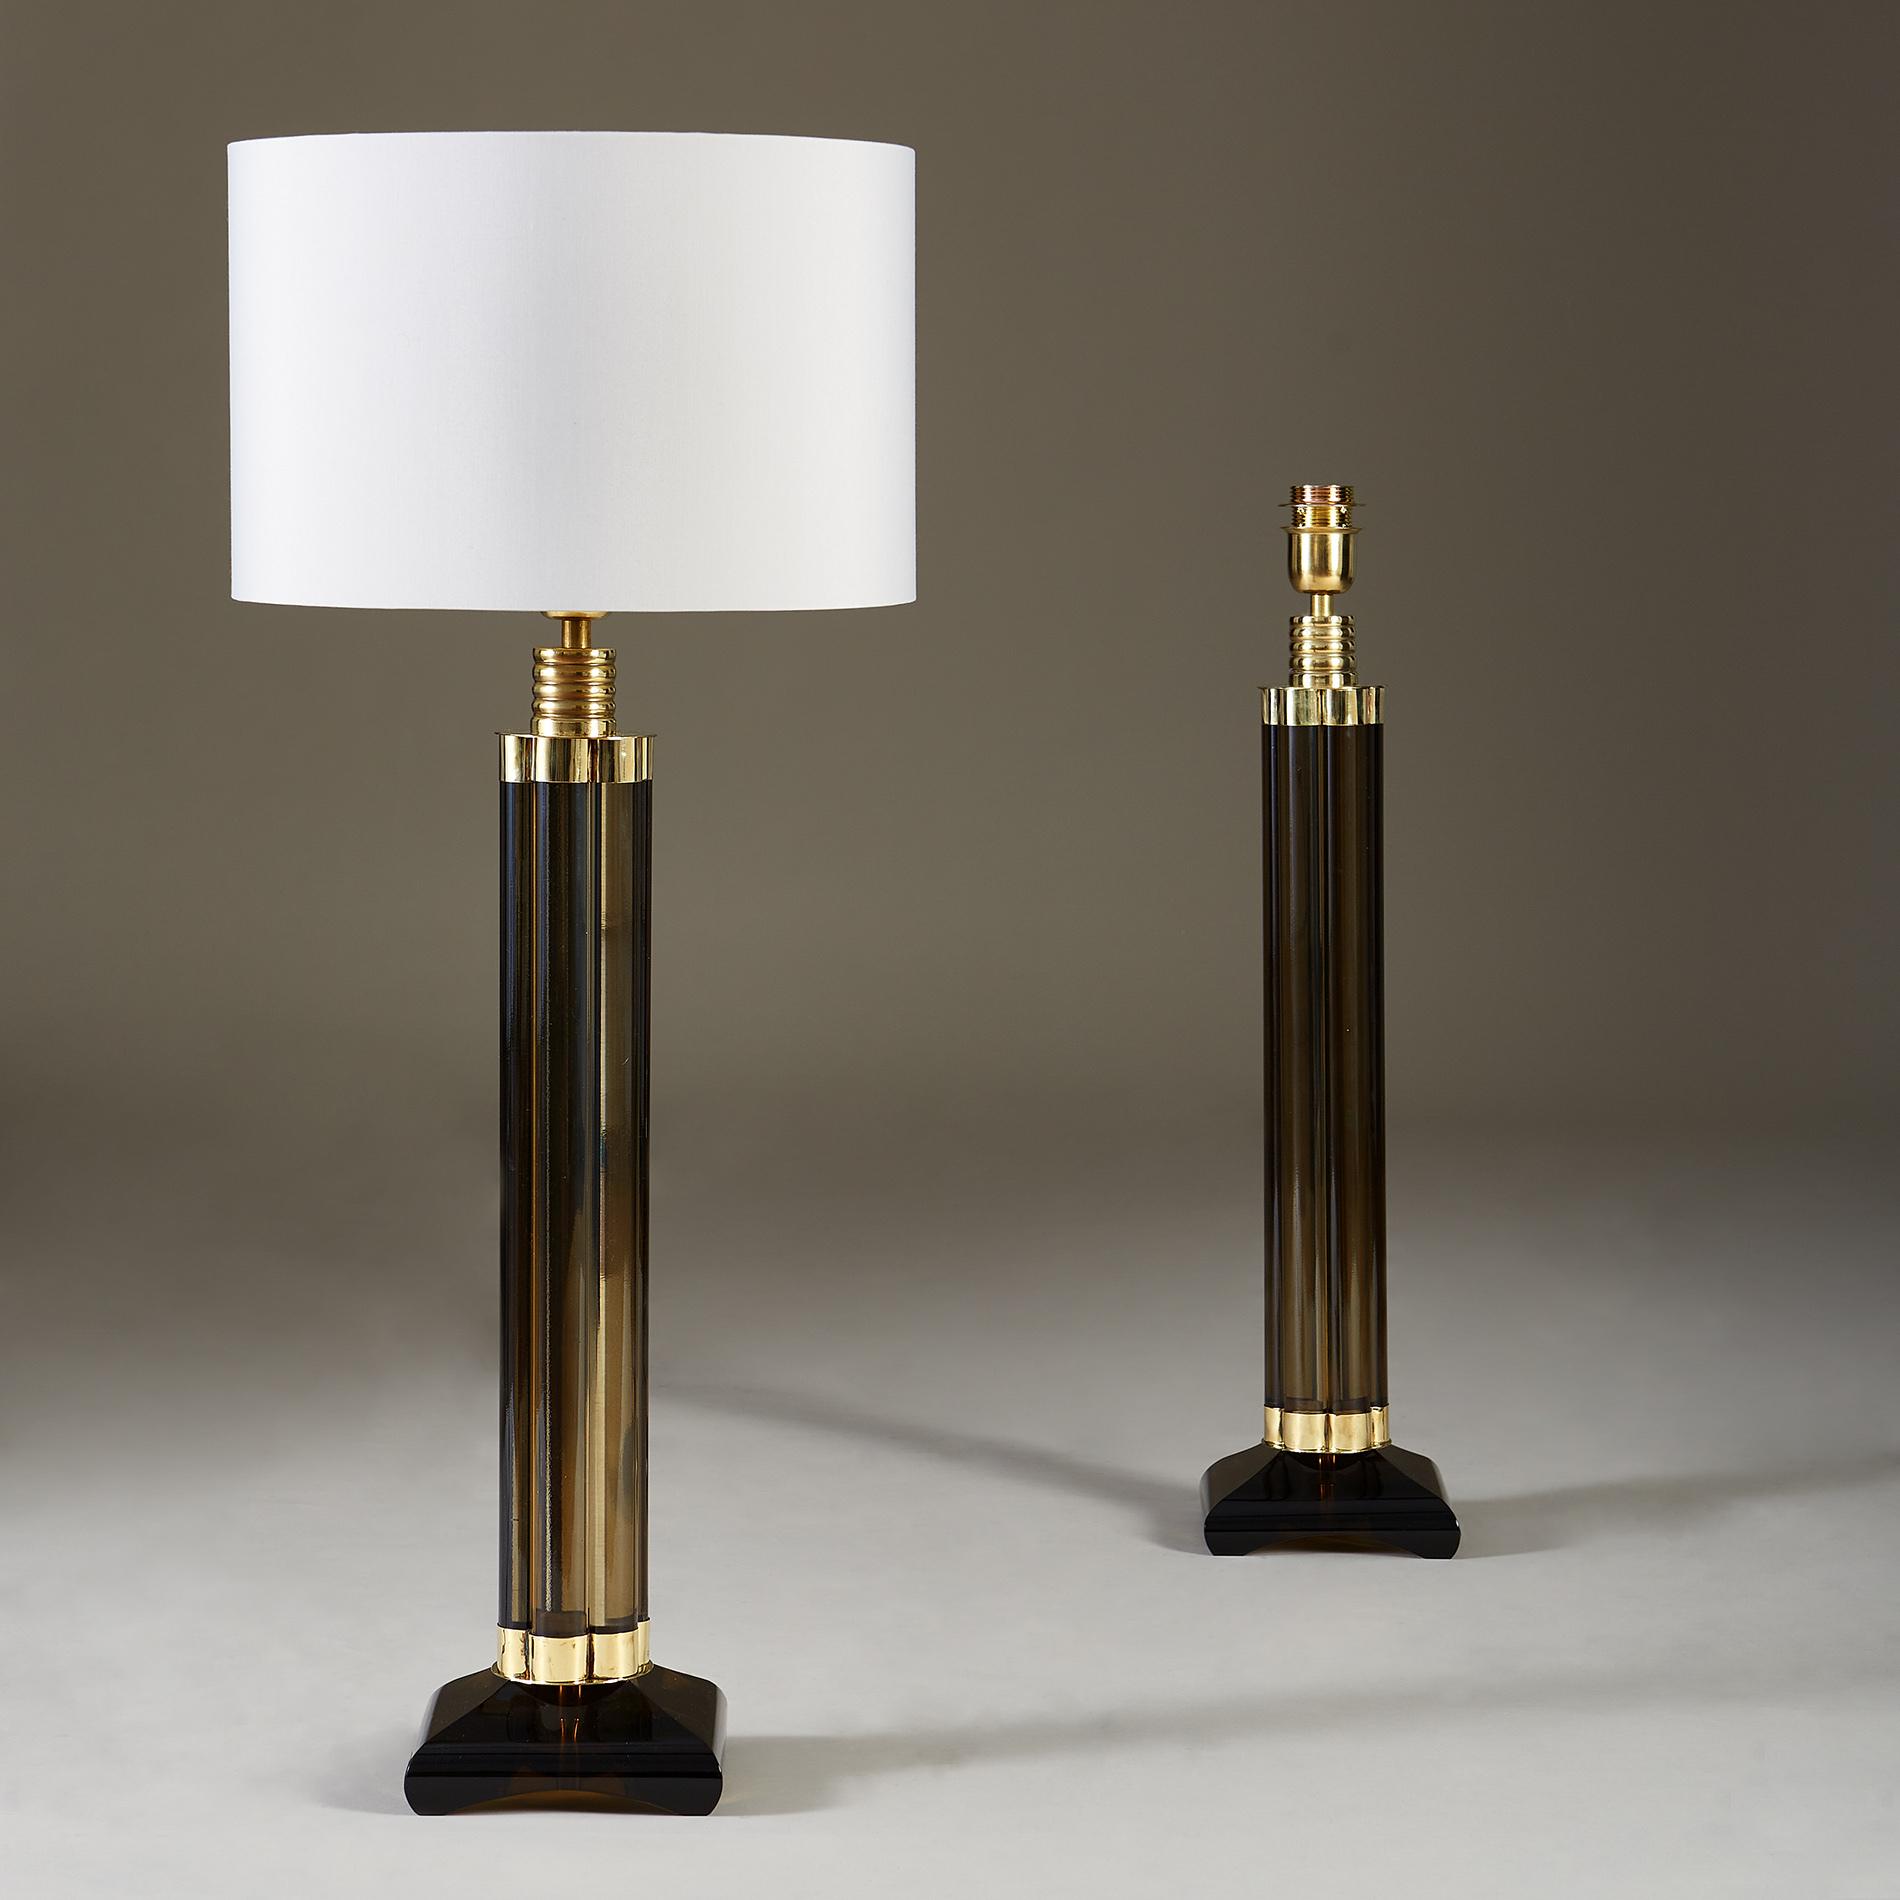 Smokey Crystal Column Lamps 20210225 Valerie Wade 2 184 V1